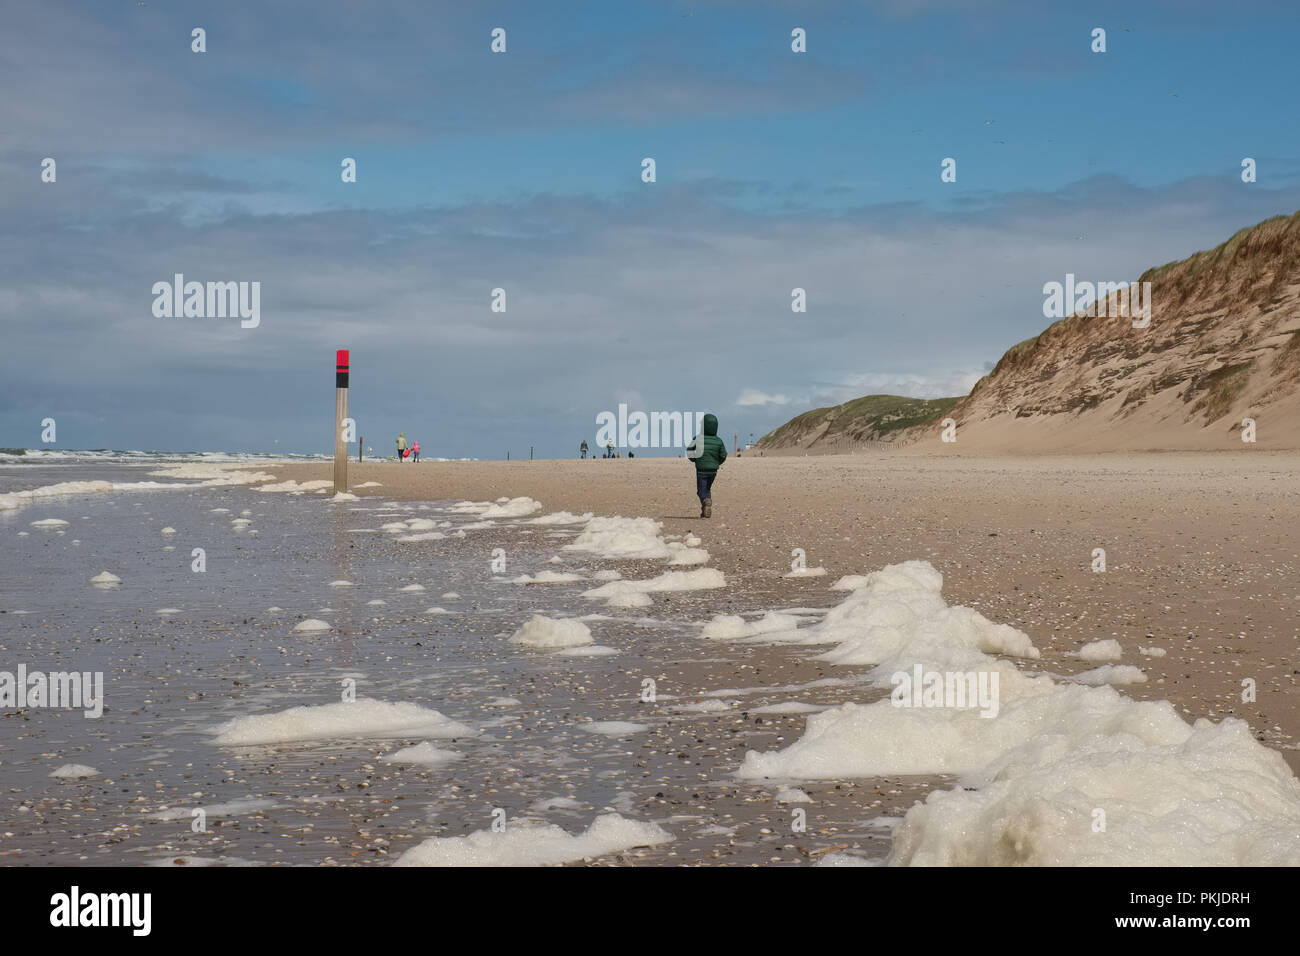 Algae (type Phaeocystis ) cover a beach in Texel, the biggest of the Waddeneilanden. Stock Photo